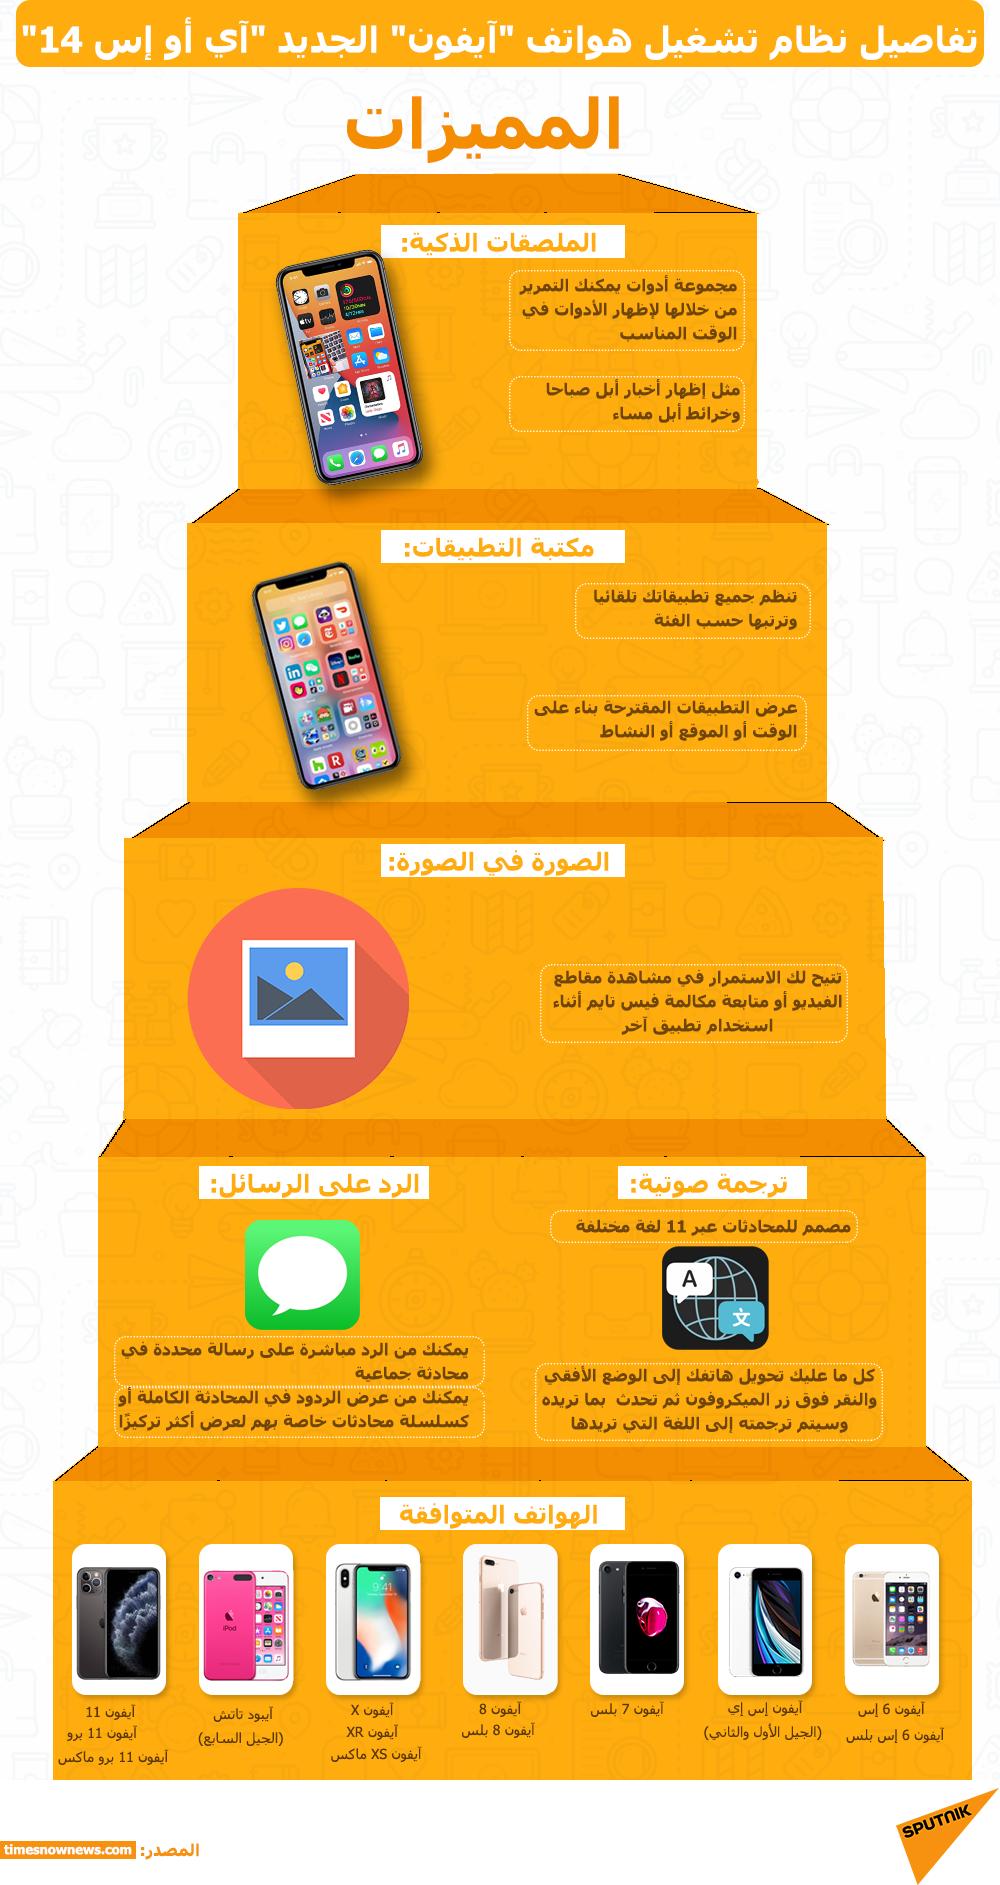 تفاصيل نظام تشغيل هواتف آيفون الجديد آي أو إس 14